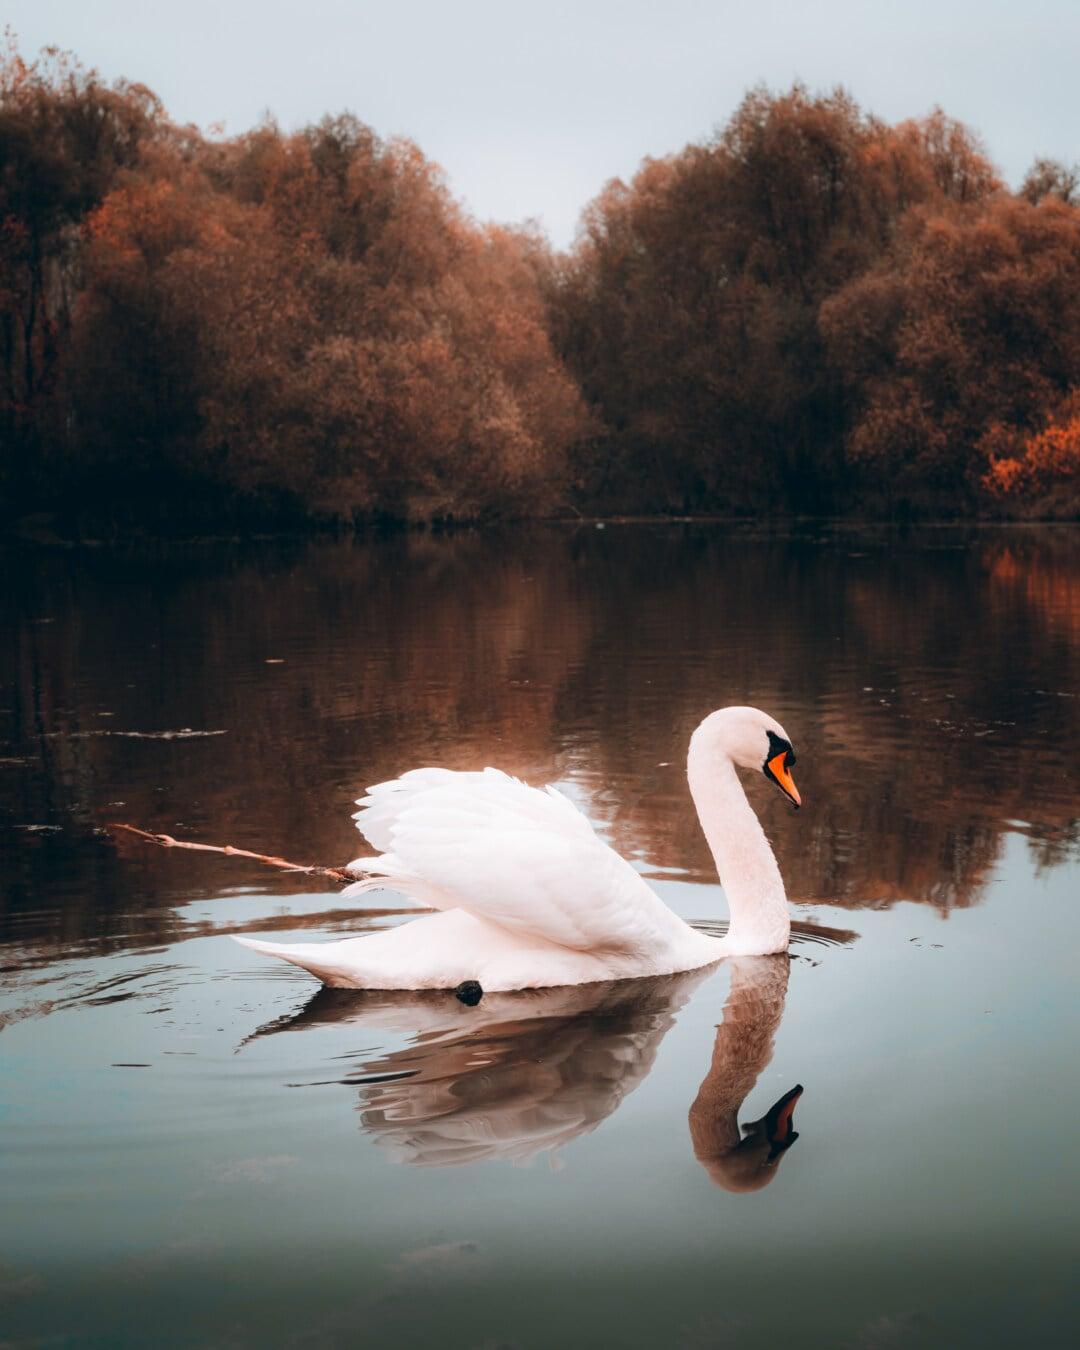 autumn season, swan, grace, swimming, reflection, lake, nature, water, wading bird, bird